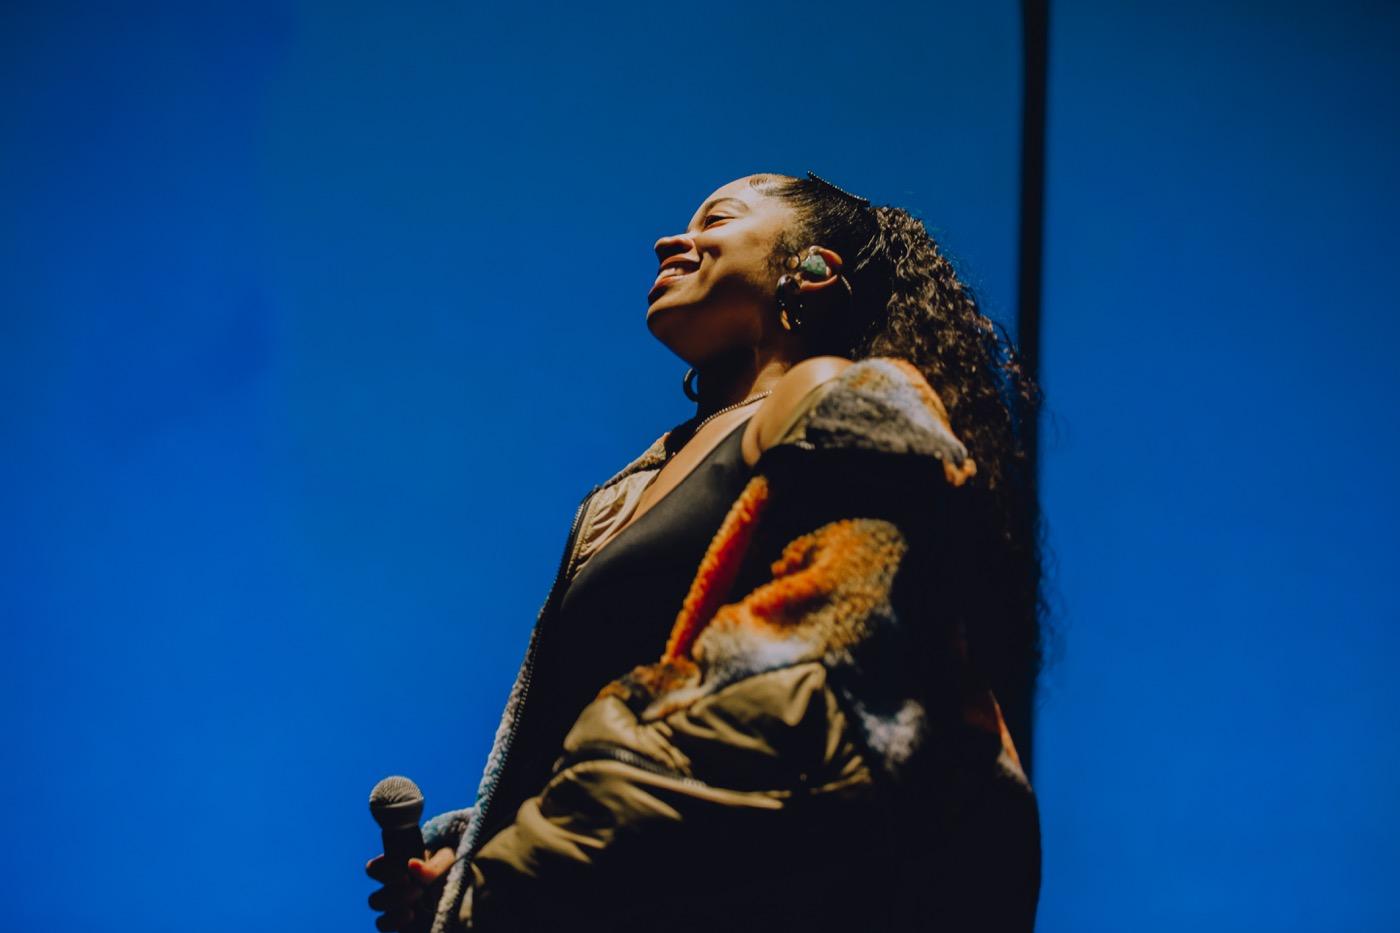 Ella Mai for Soulection Experience @ The Shrine Auditorium 2/2/19. Photo by Summer Dos Santos (@SummerDosSantos) for www.BlurredCulture.com.